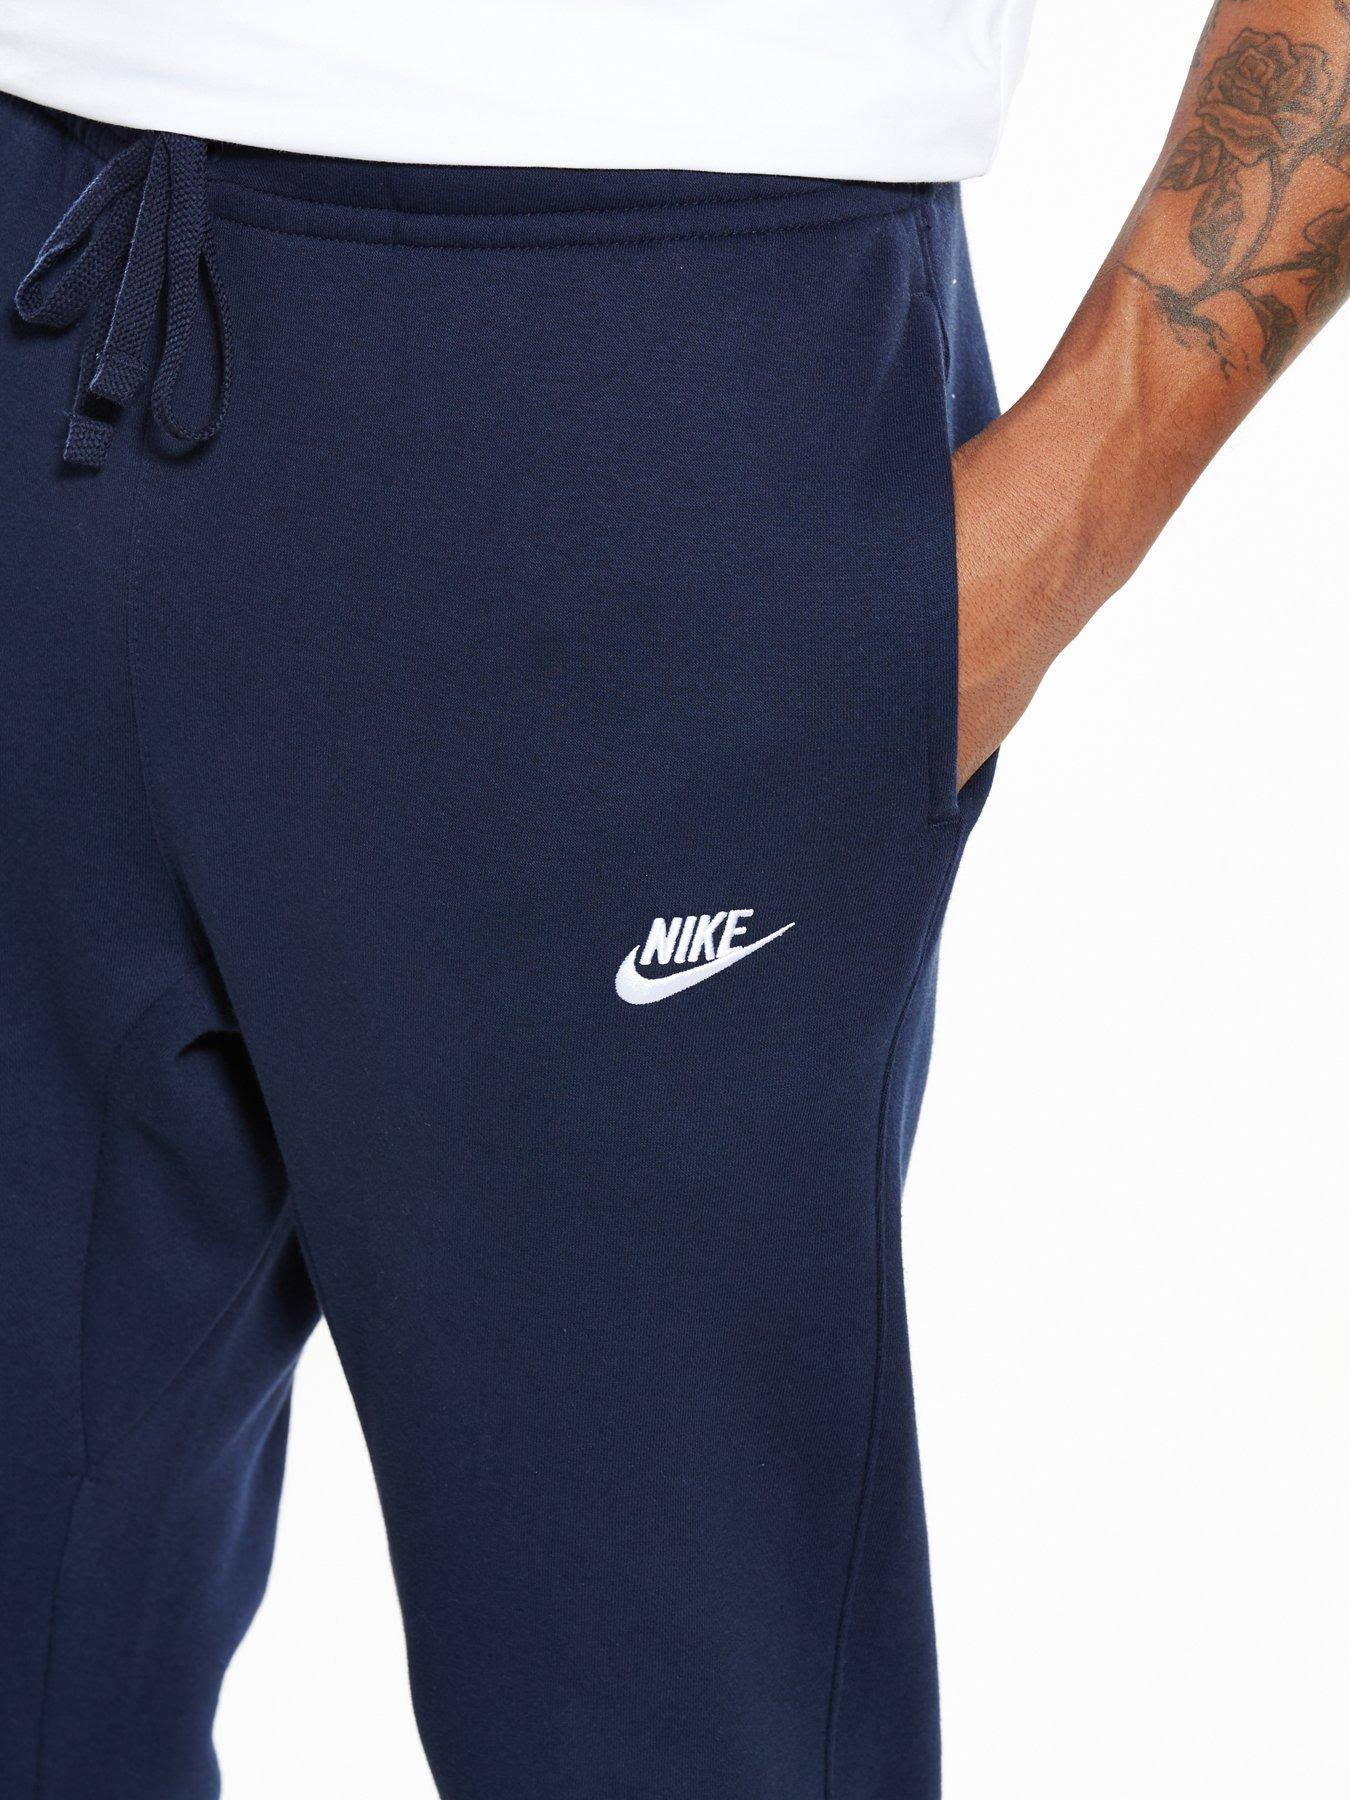 Nike S Club Blue S Blue Nike Sportswear Club Club S Sportswear Nike Sportswear TK13cuJlF